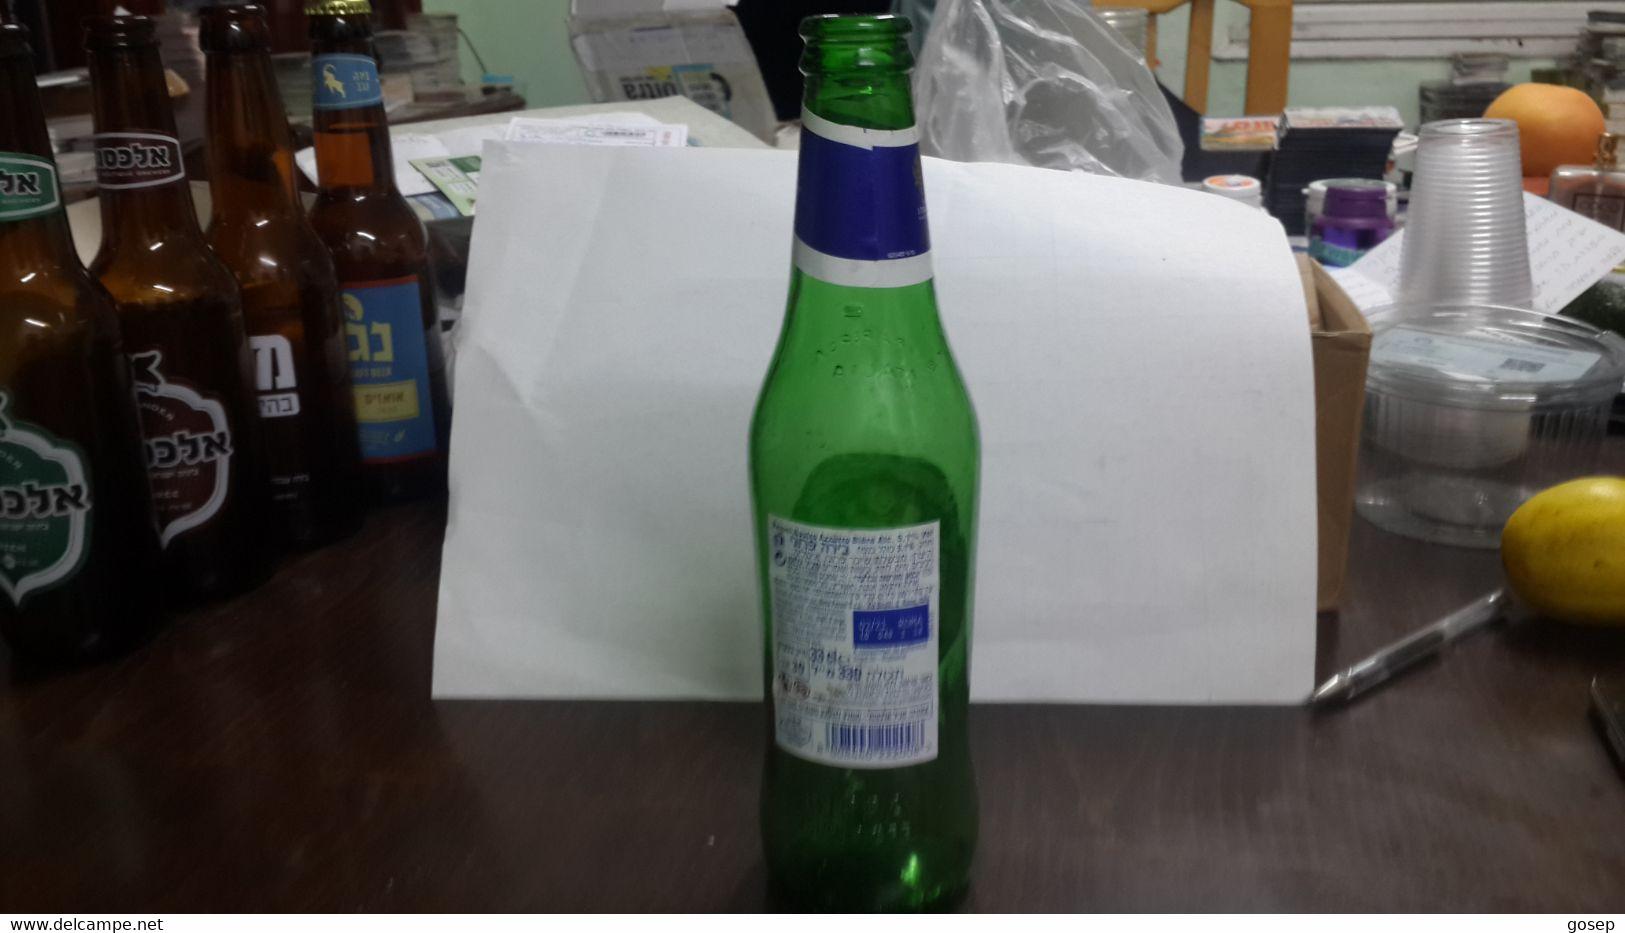 Italia-beer-peroni Nastro Azzurro Beer-(5.1%)-(330ml) - Unclassified